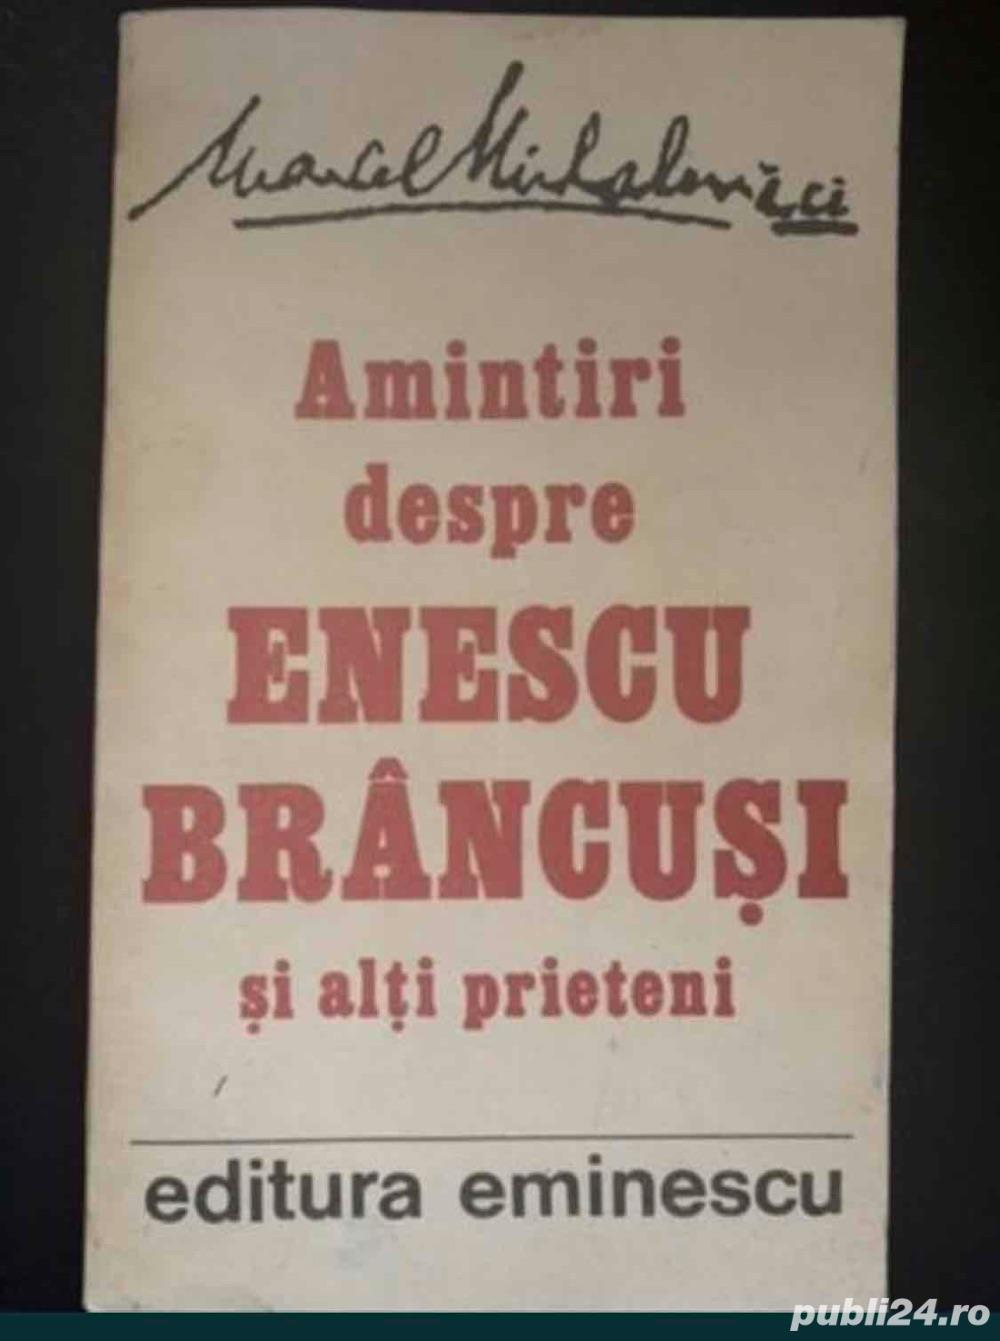 Amintiri despre Enescu, Brancusi si alti prieteni, autor Marcel Mihalovici